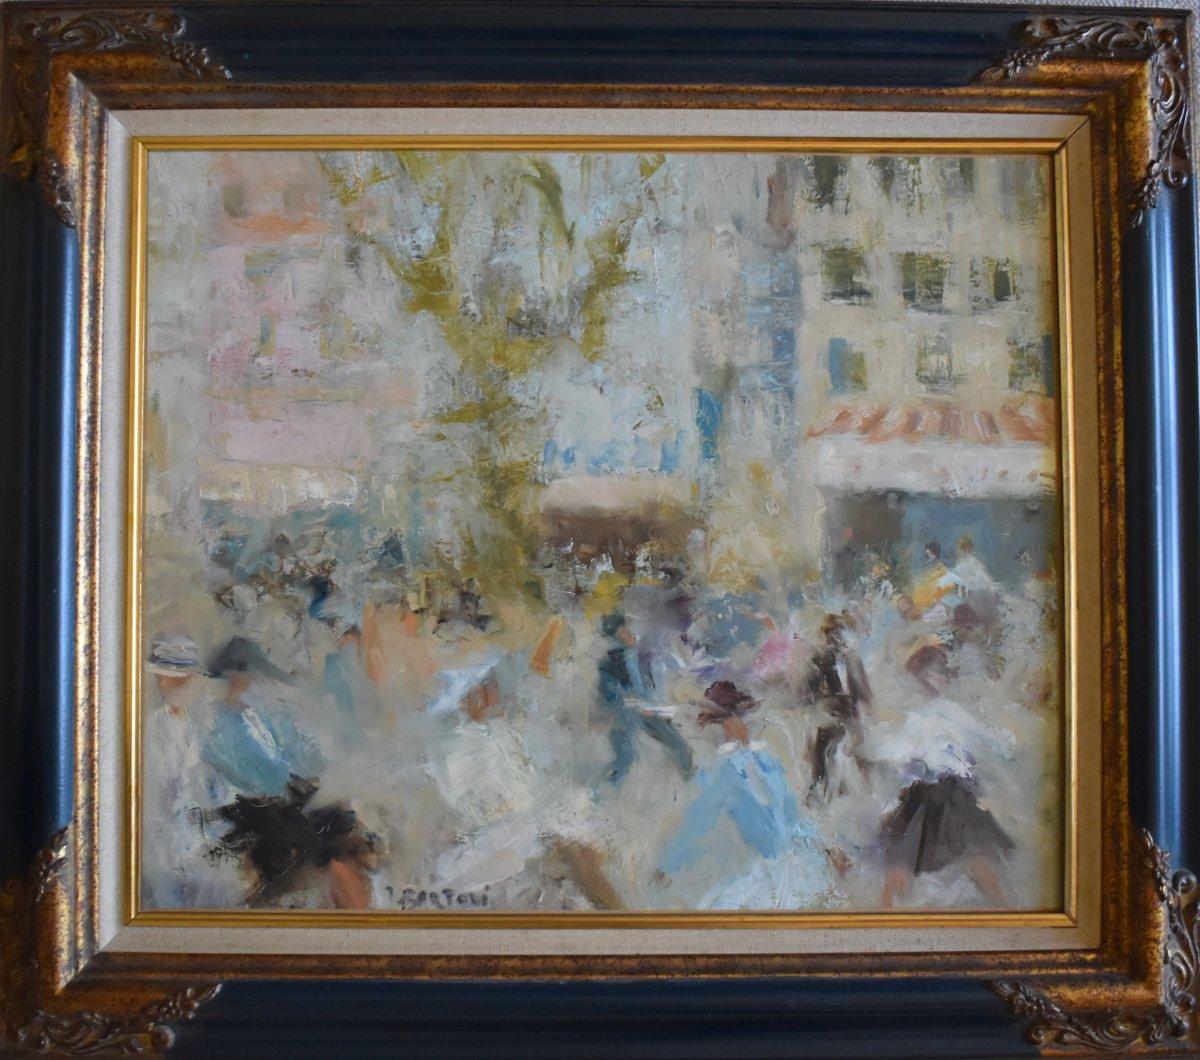 Jacques Bartoli (1920-1995) Place Puget Toulon